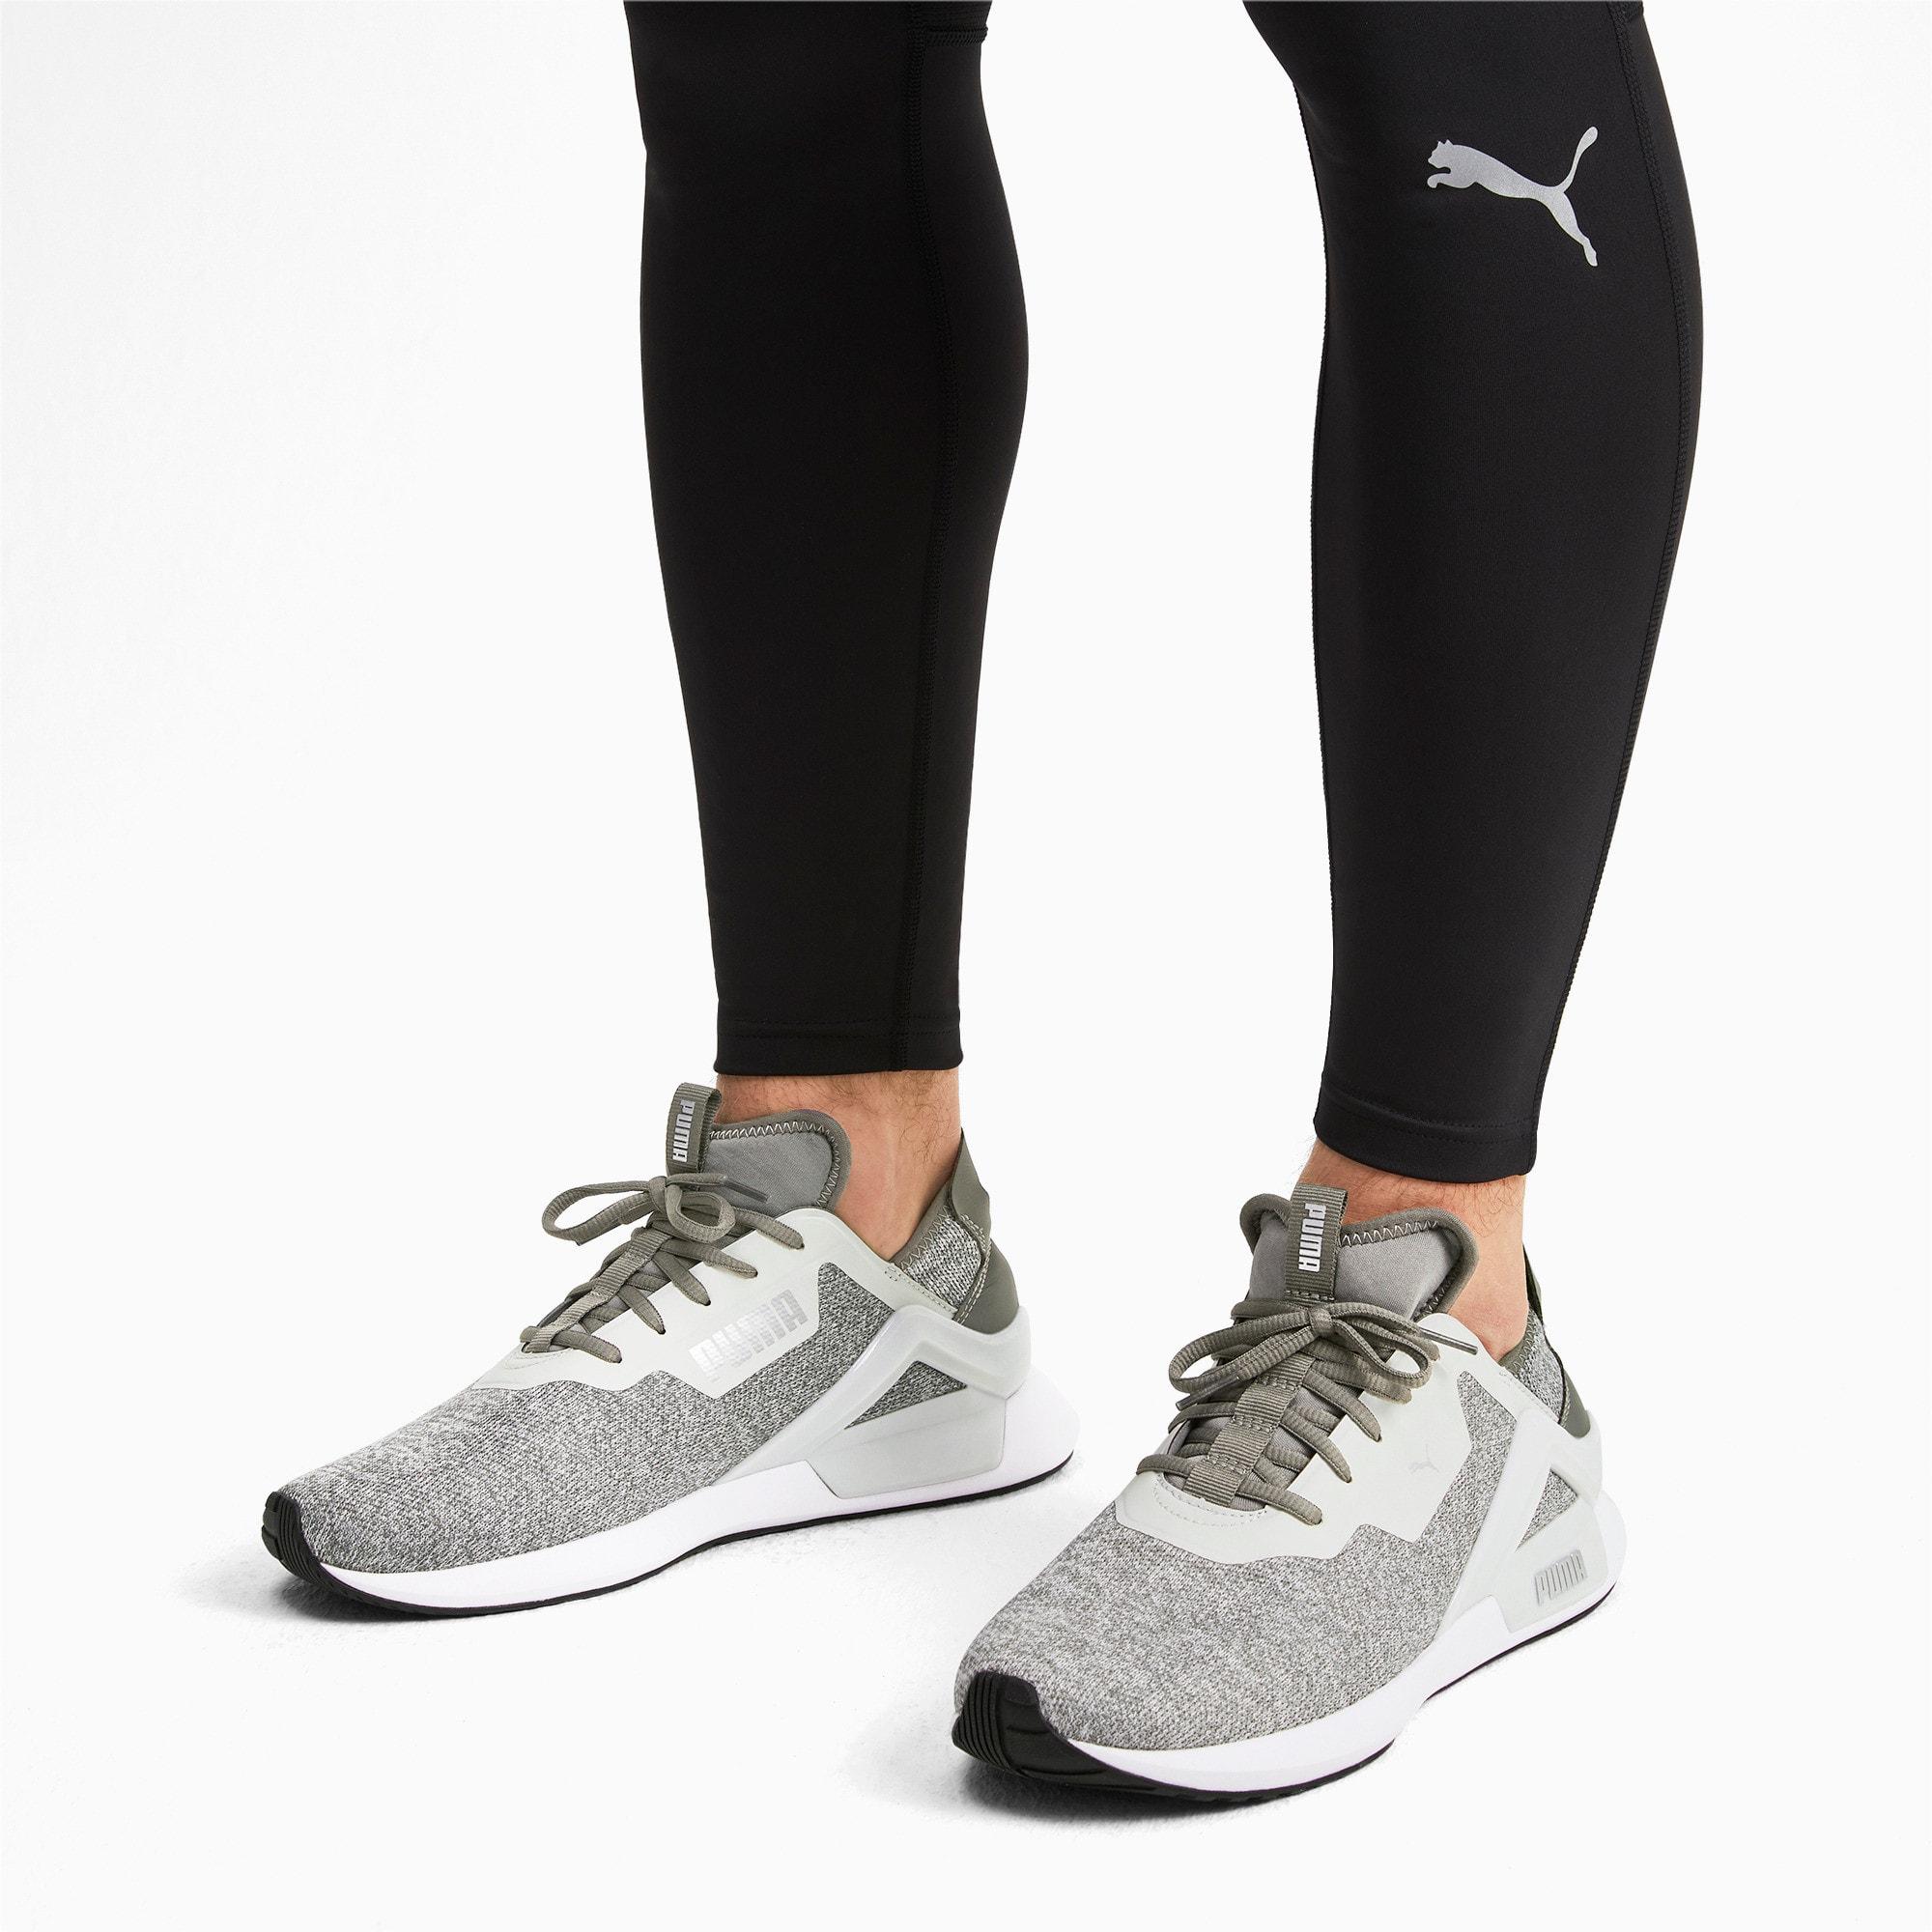 Thumbnail 2 of Rogue X Knit Herren Sneaker, CASTLEROCK-Glacier Gray, medium